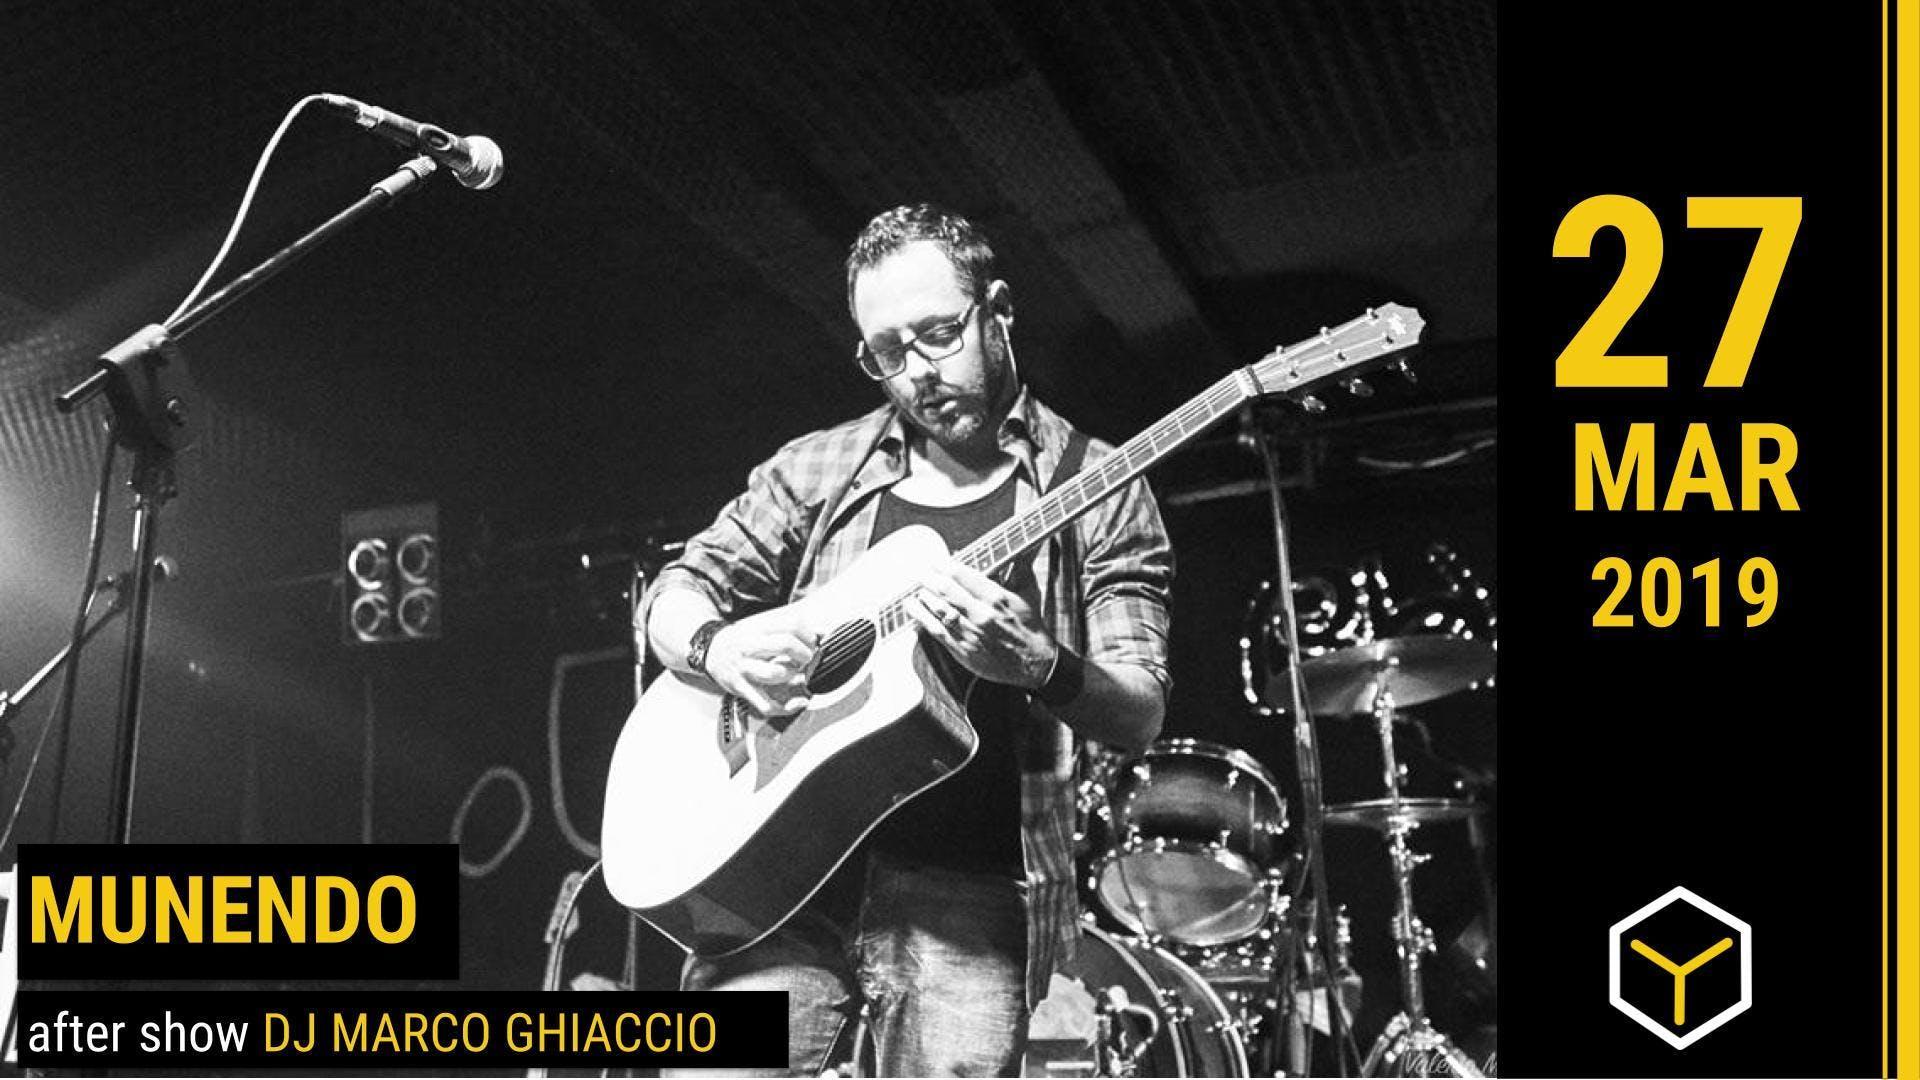 Munendo + Micol - The Yellow Bar